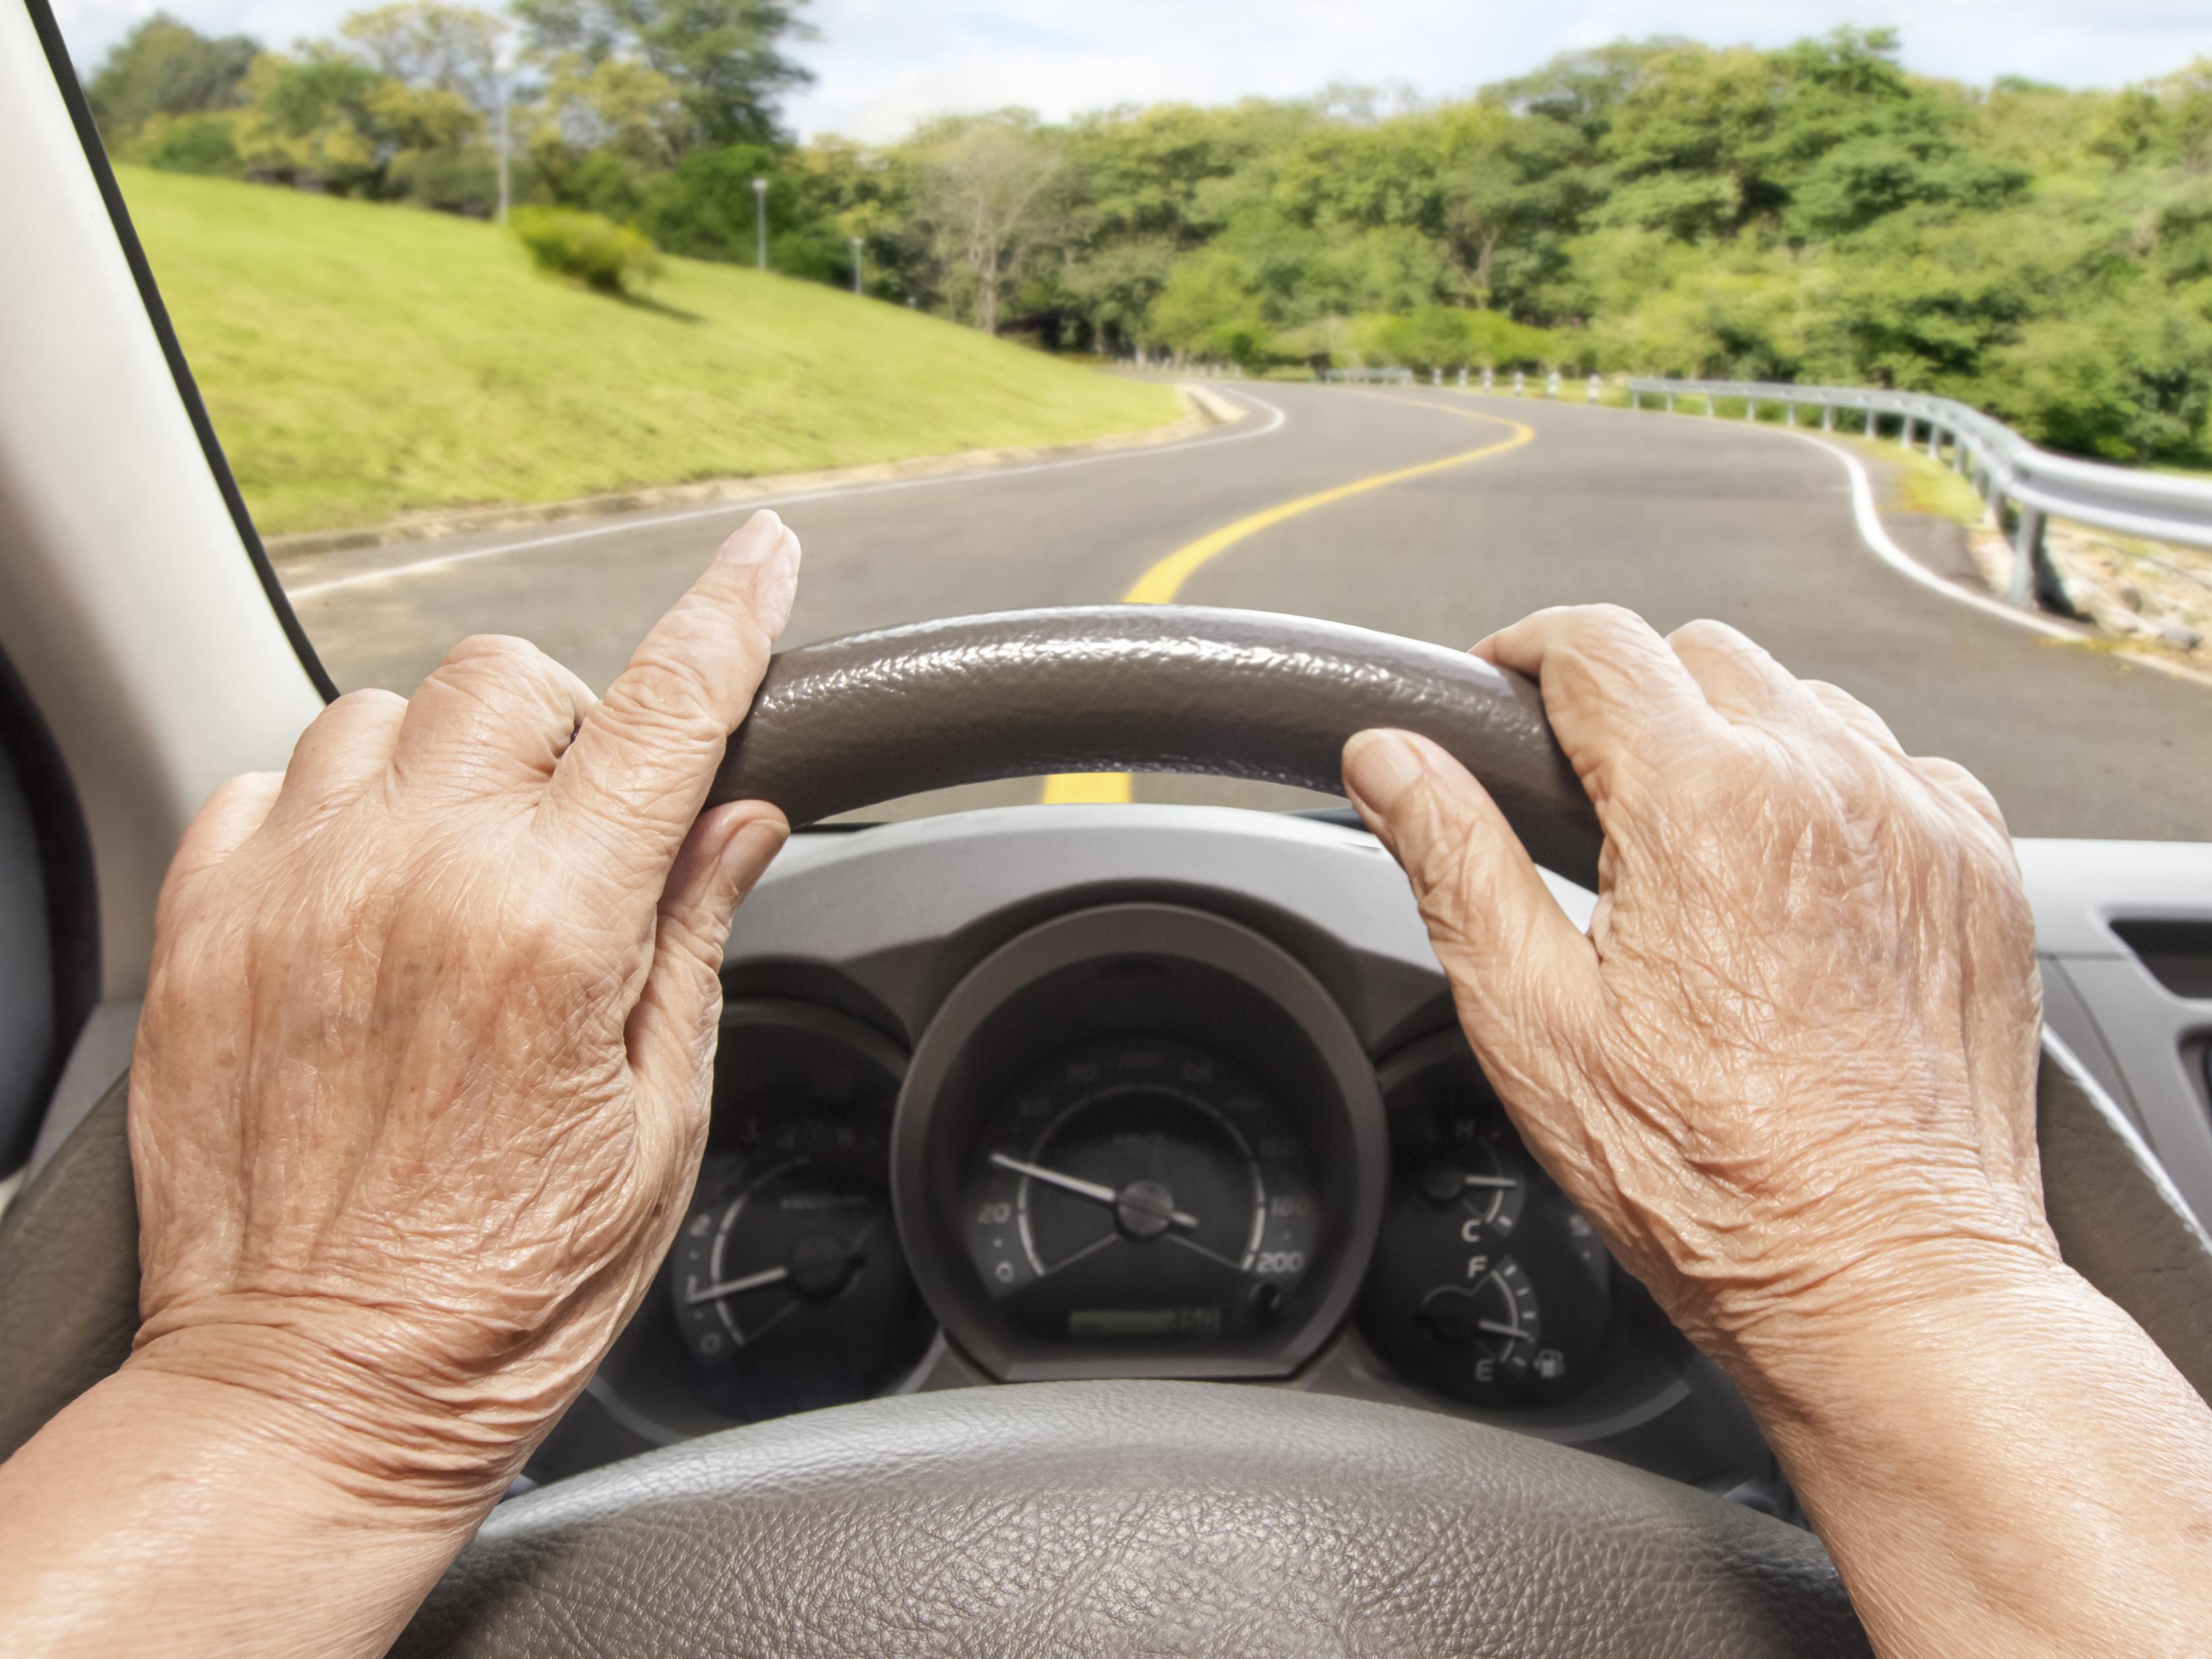 The bad habit that kills older people